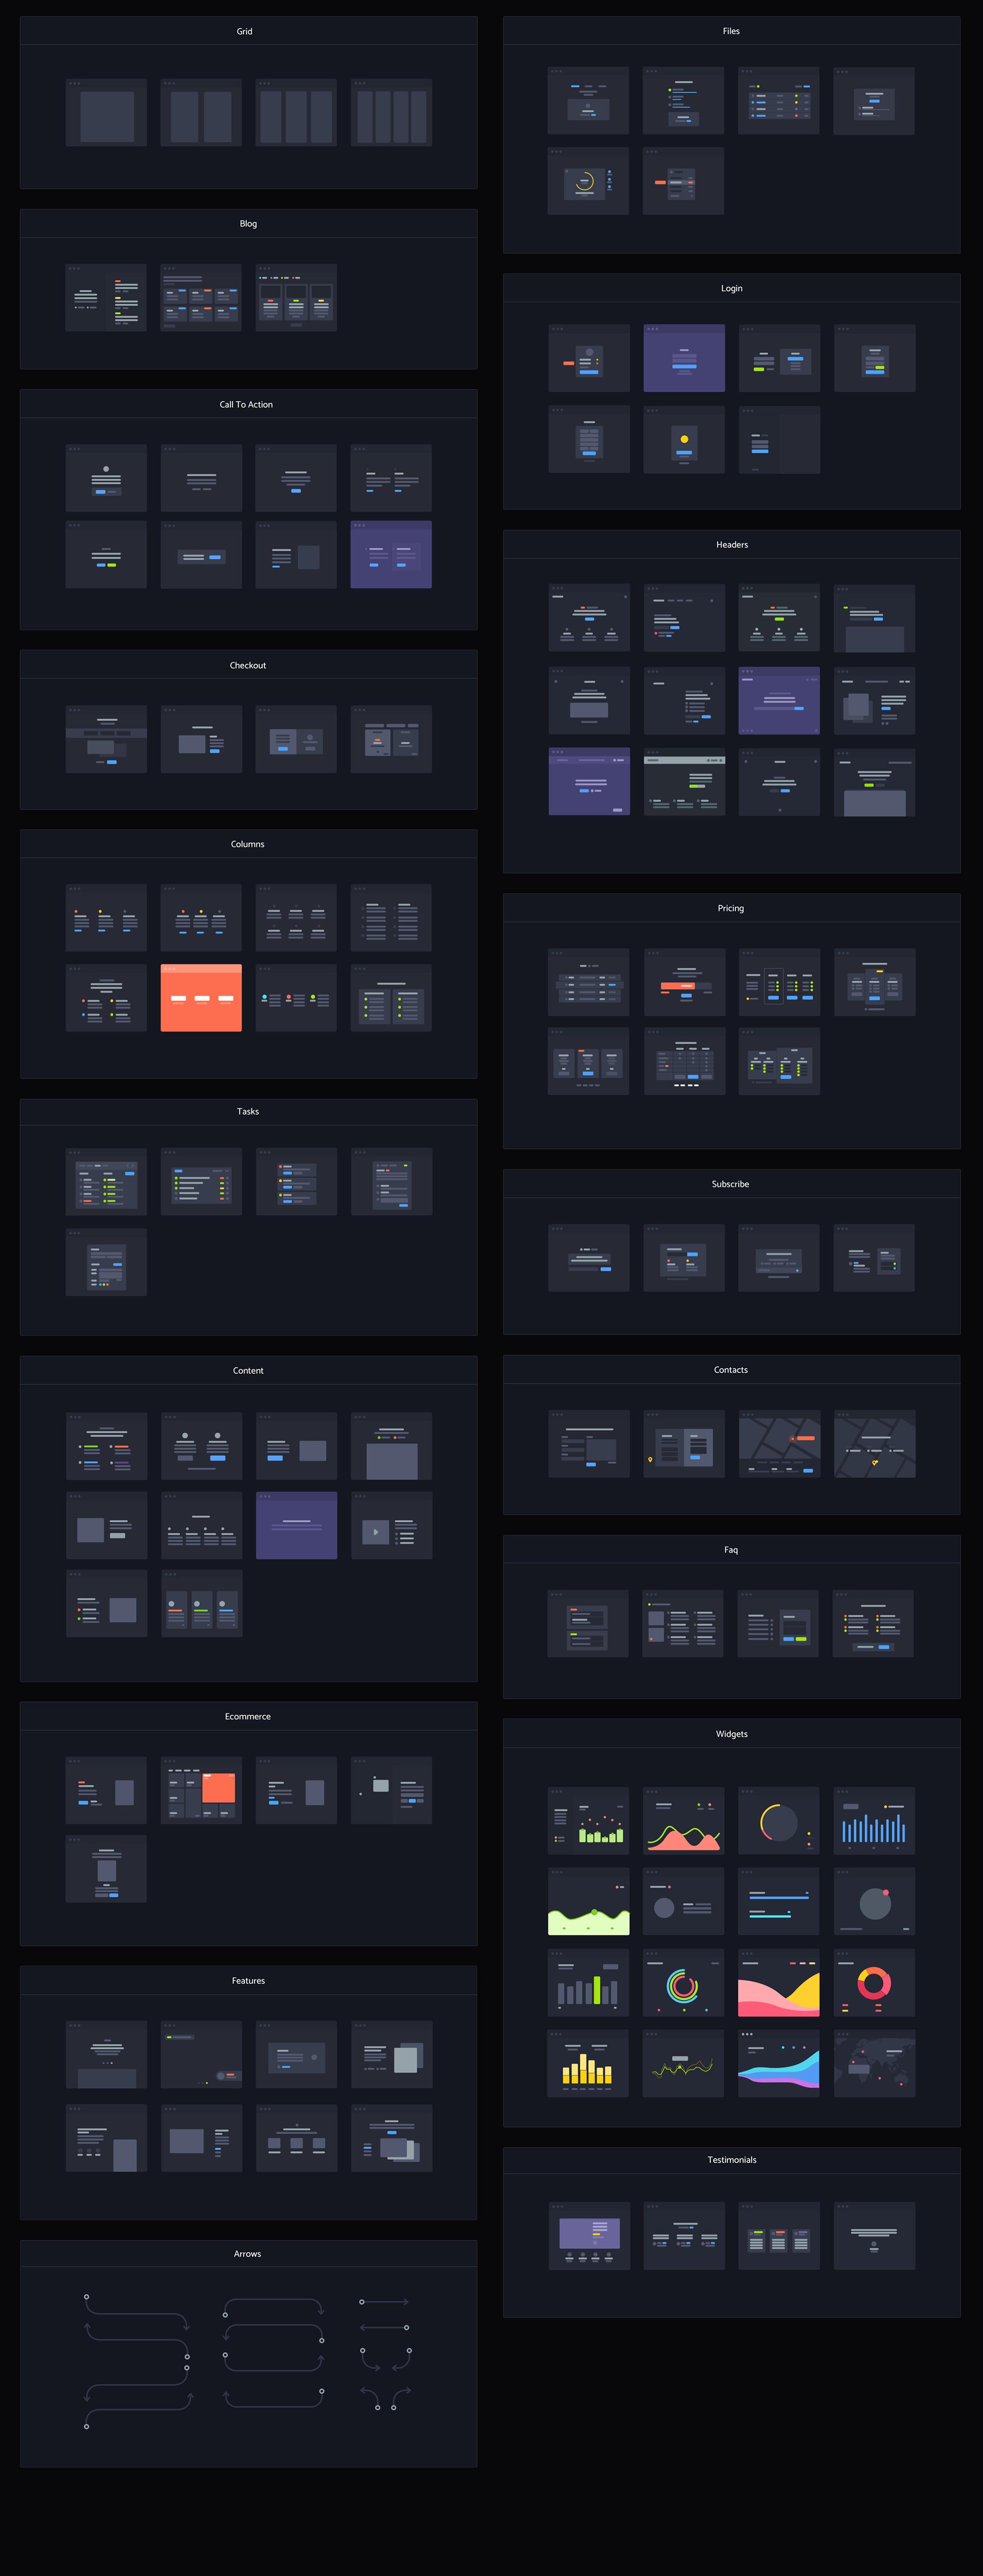 [VIP专享]绝对精品高质量的UI / UX设计工具包黑白两种风格.Sketch&Photoshop&XD素材下载 VIP主题包-第20张